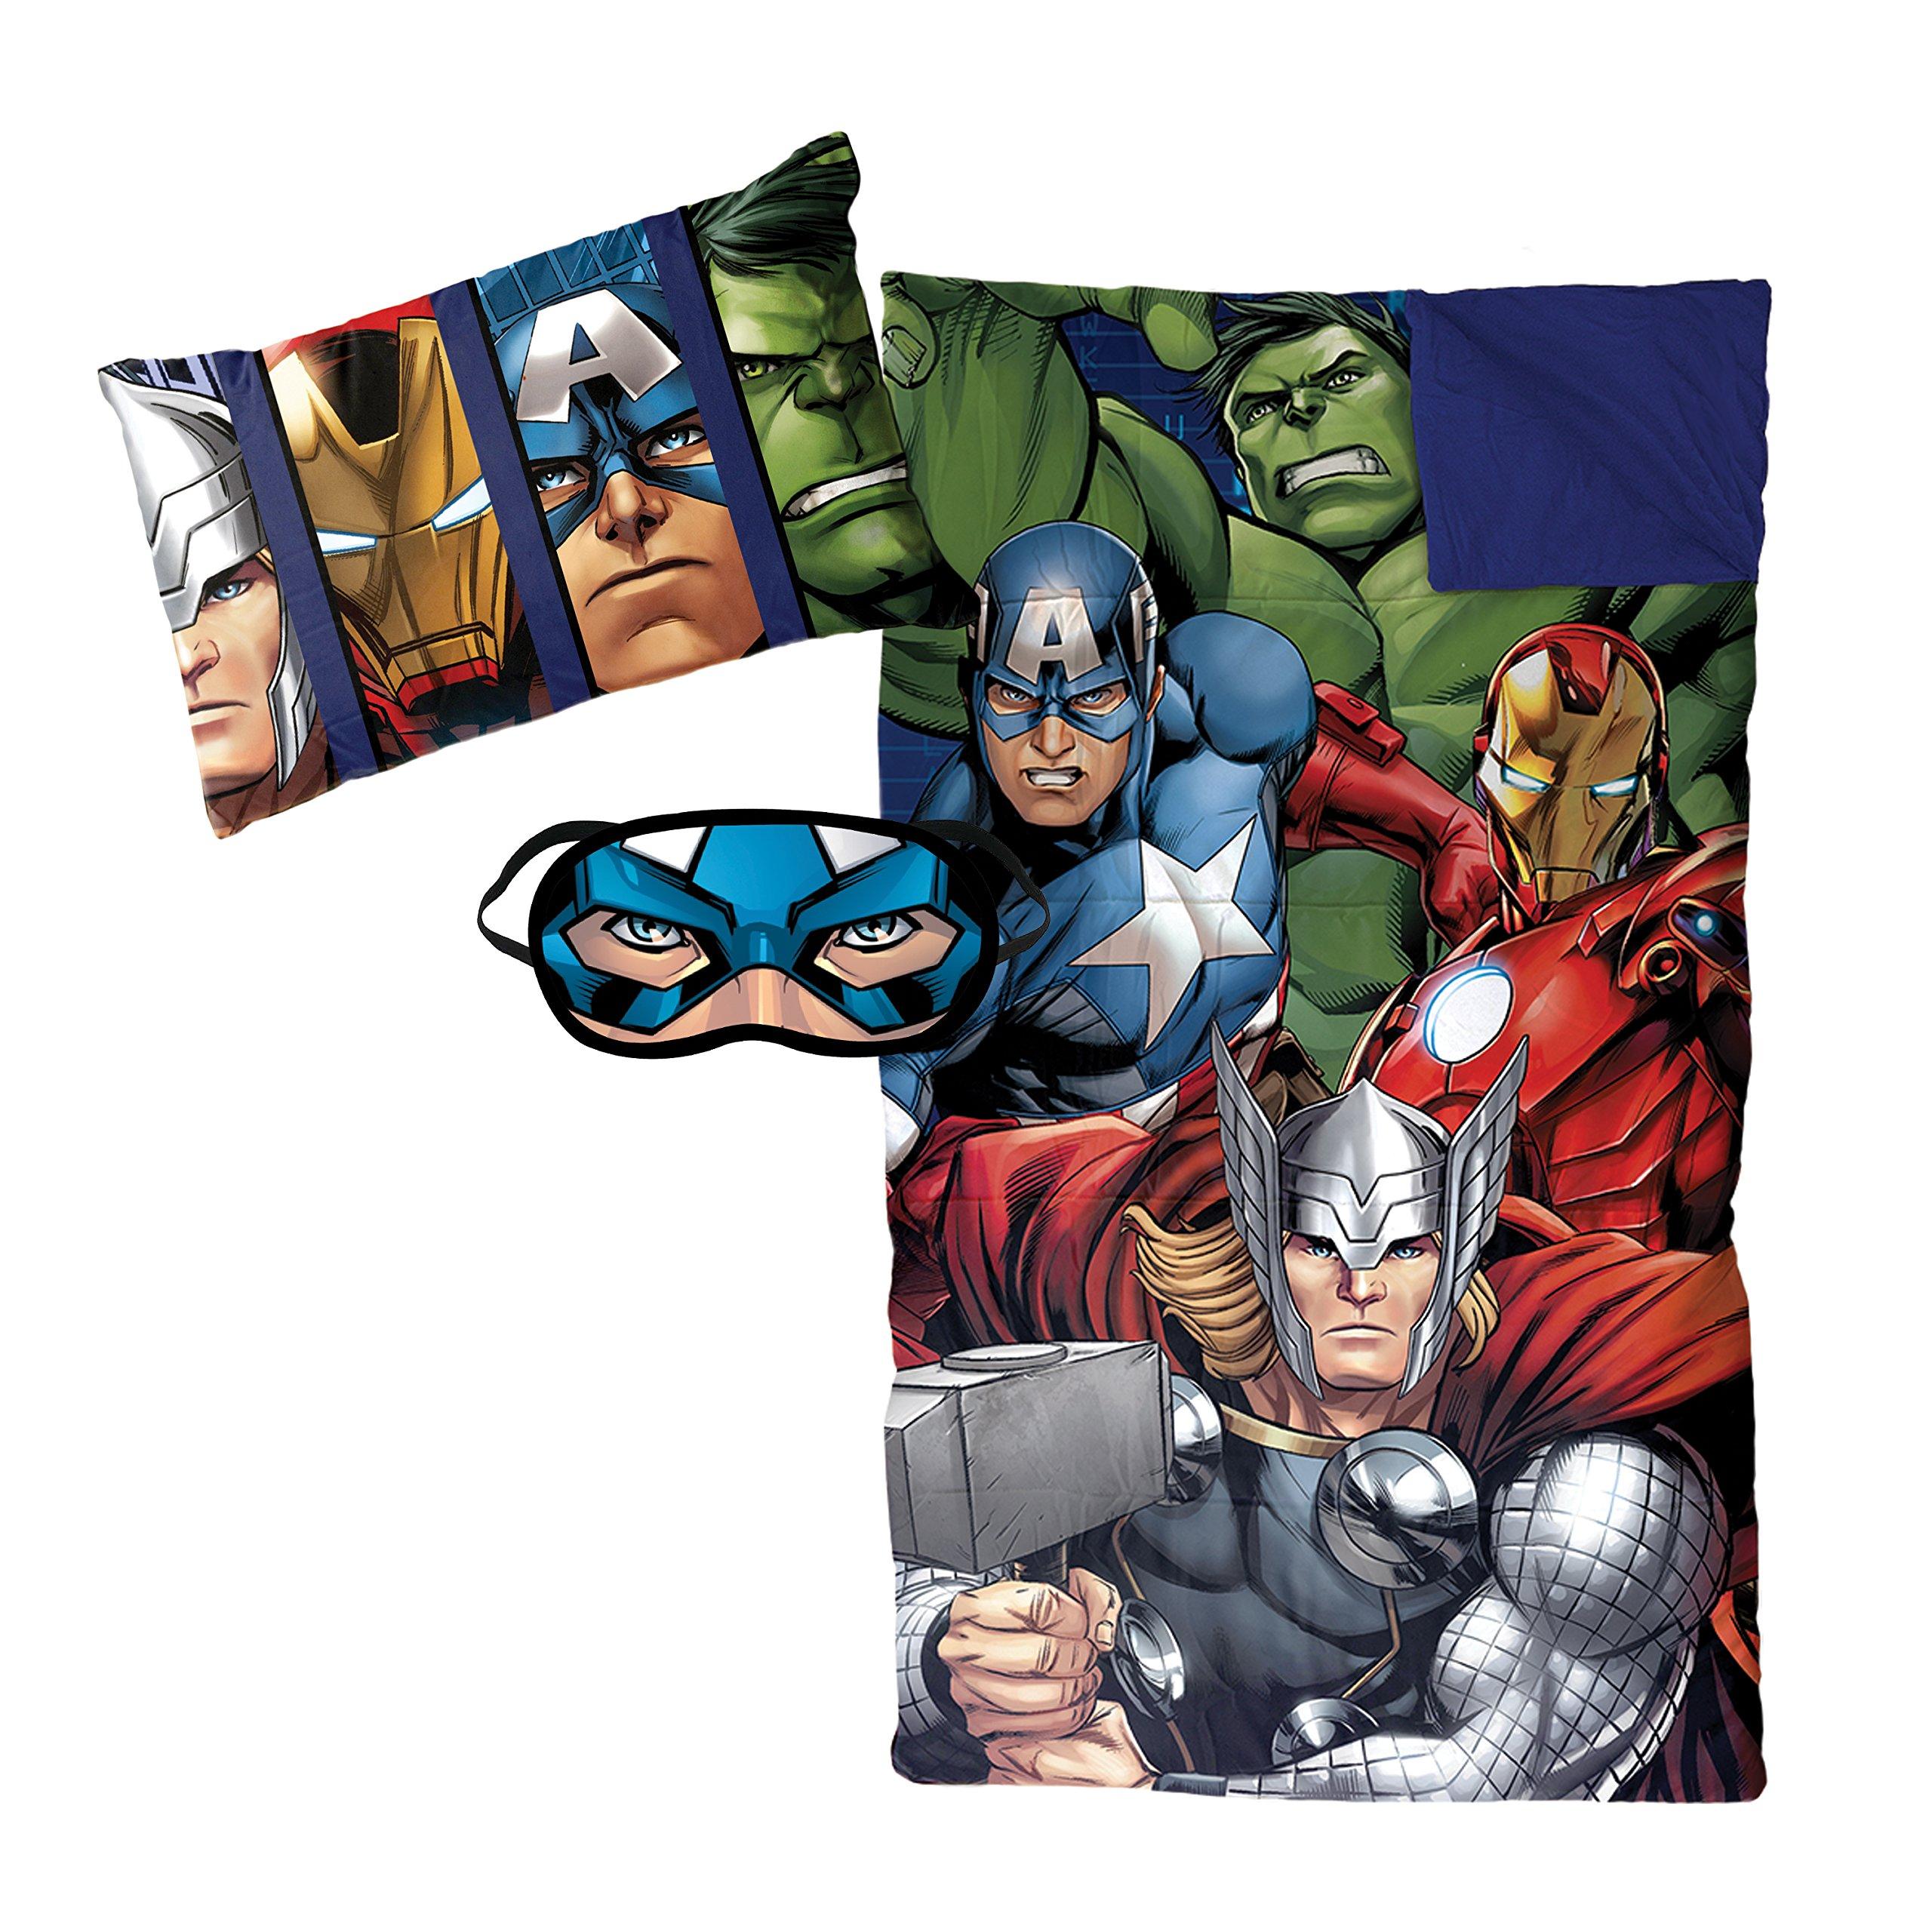 Jay Franco Marvel Avengers Assemble 3 Piece Plush Sleepover Set